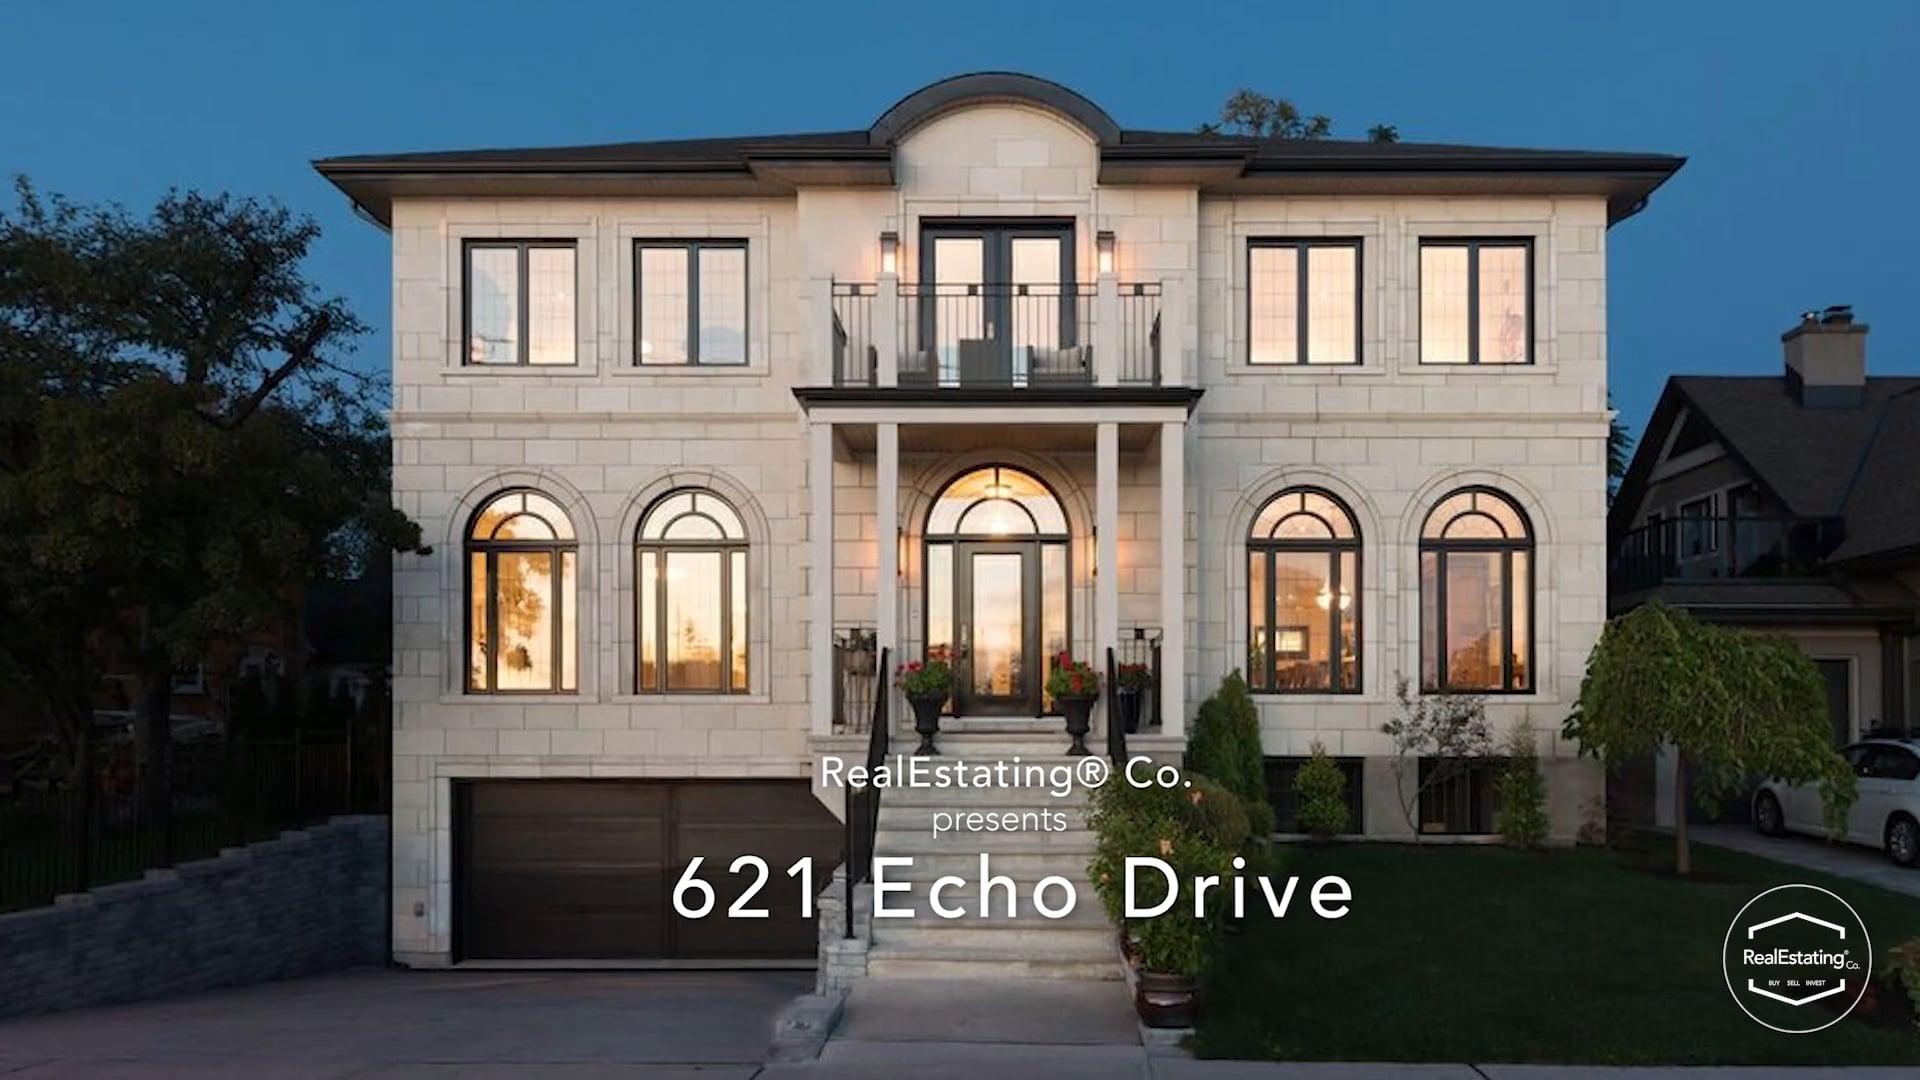 621 Echo Drive | RealEstating Co.